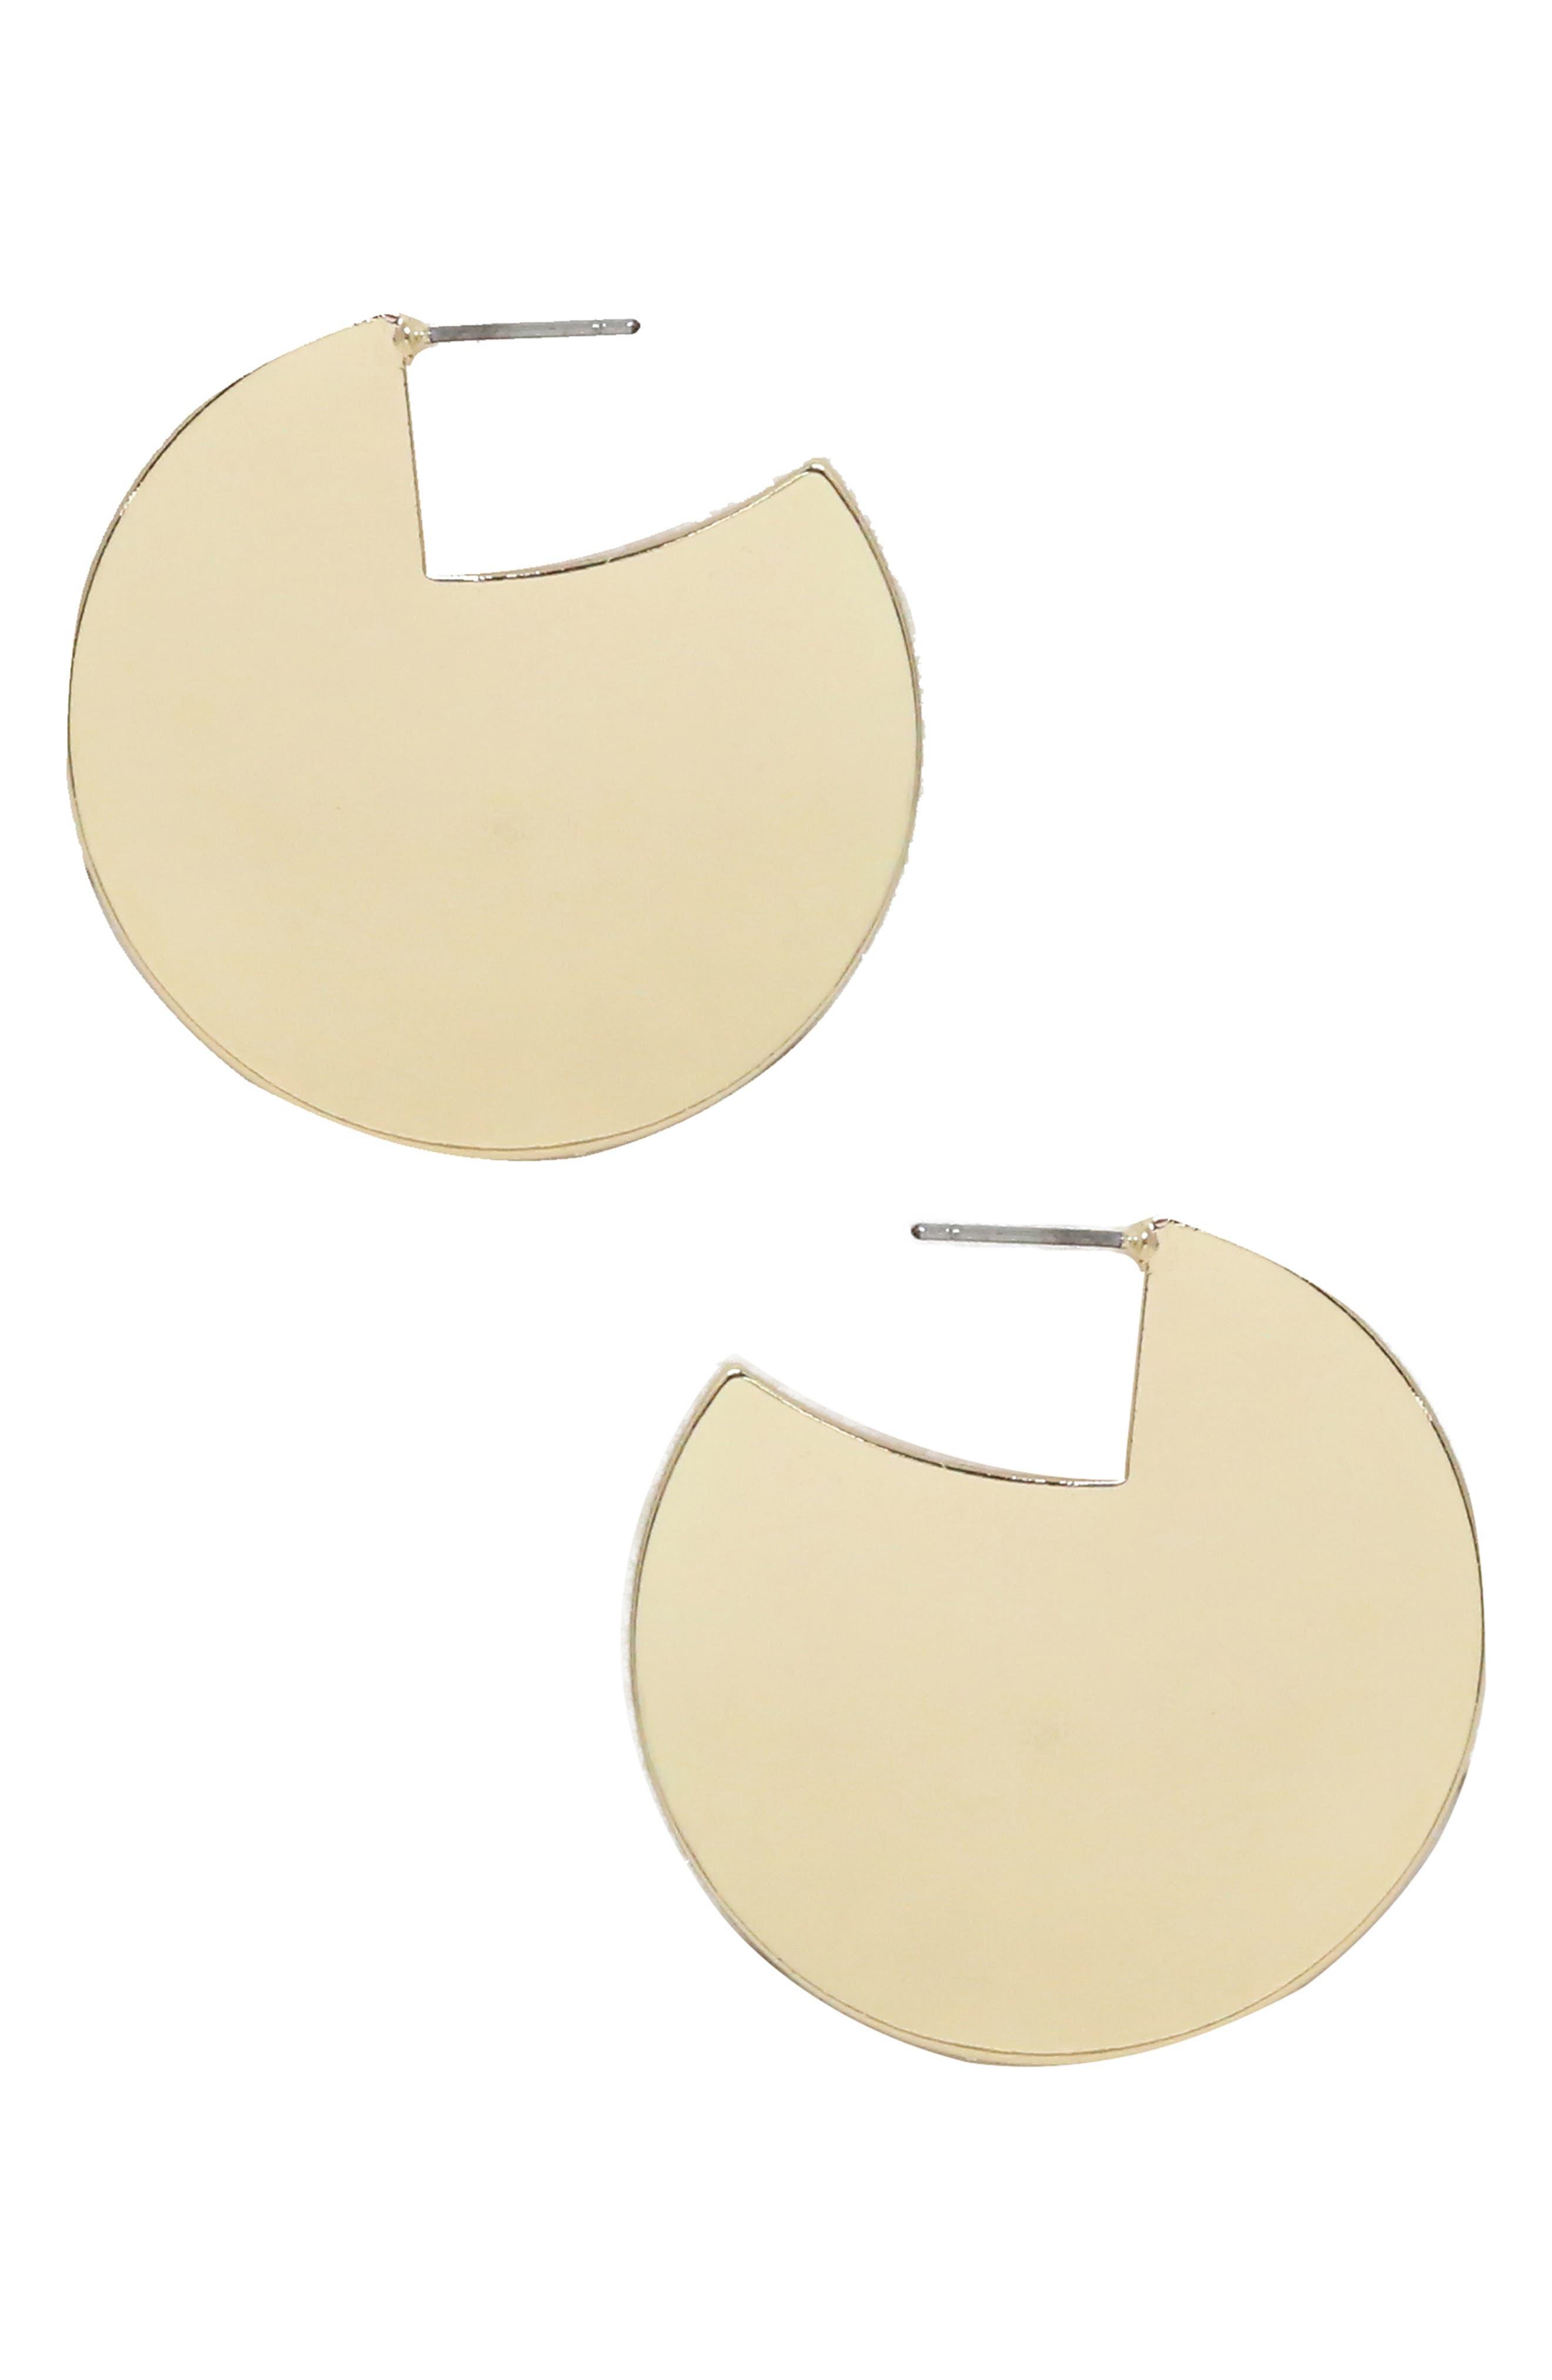 60s -70s Jewelry – Necklaces, Earrings, Rings, Bracelets Womens Ettika Mod Disc Earrings $35.00 AT vintagedancer.com